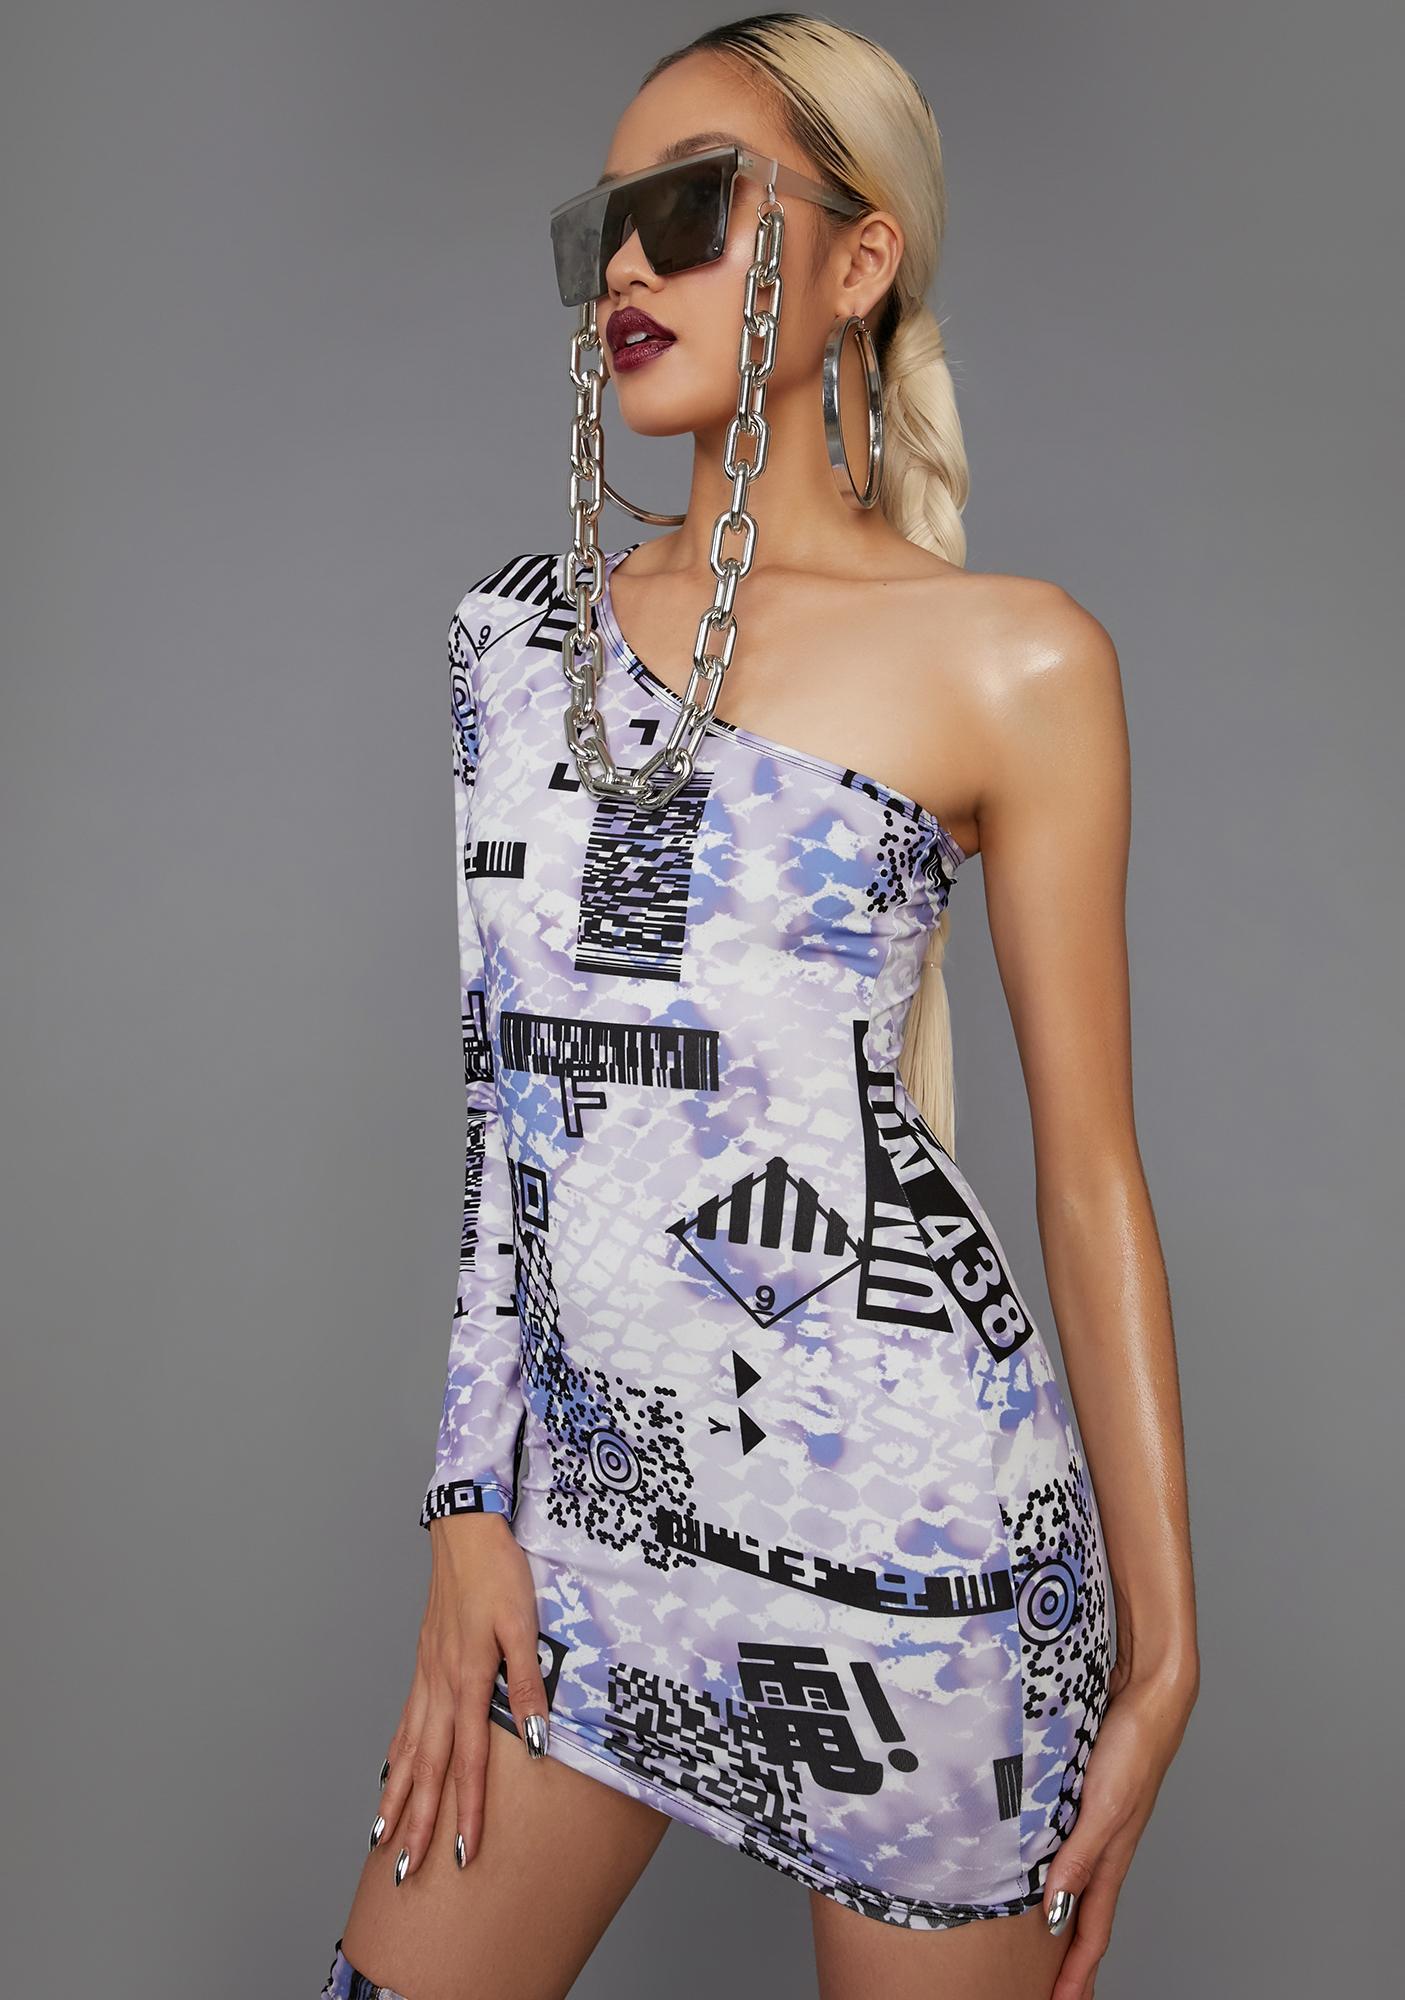 Poster Grl QR Cutie Asymmetrical Mini Dress